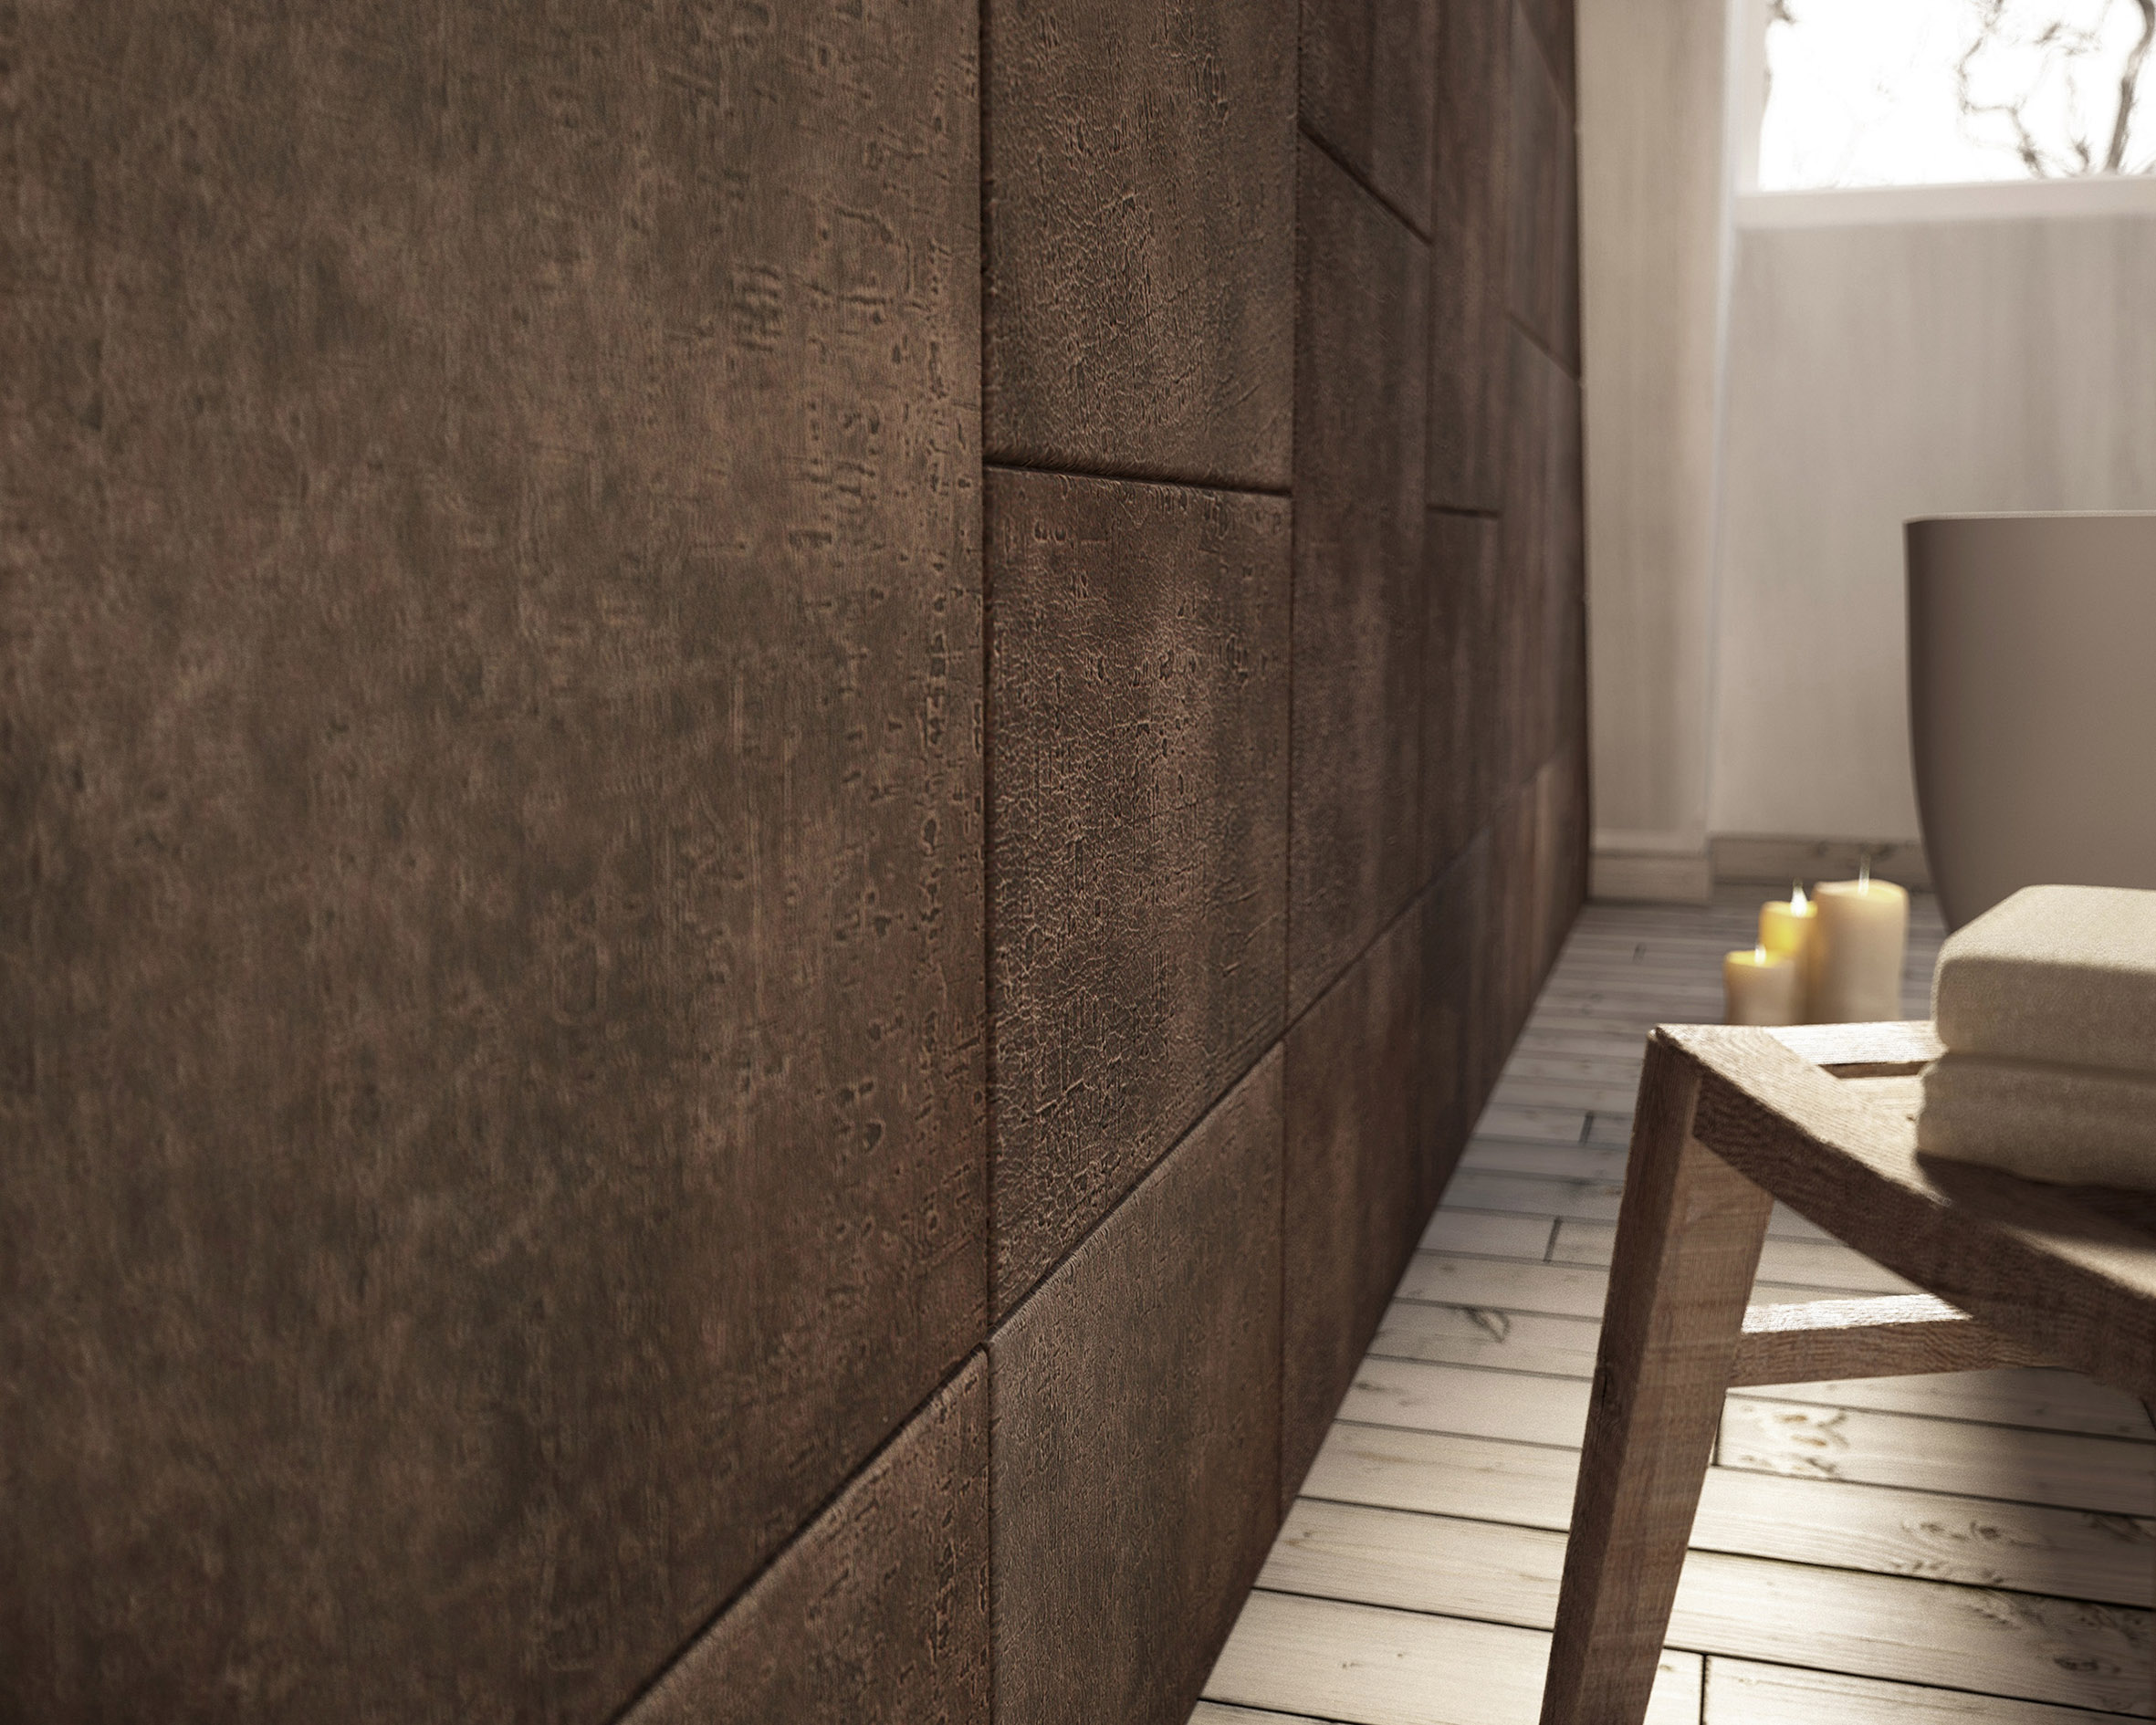 Badkamer tegel coating - Tegel patroon badkamer ...